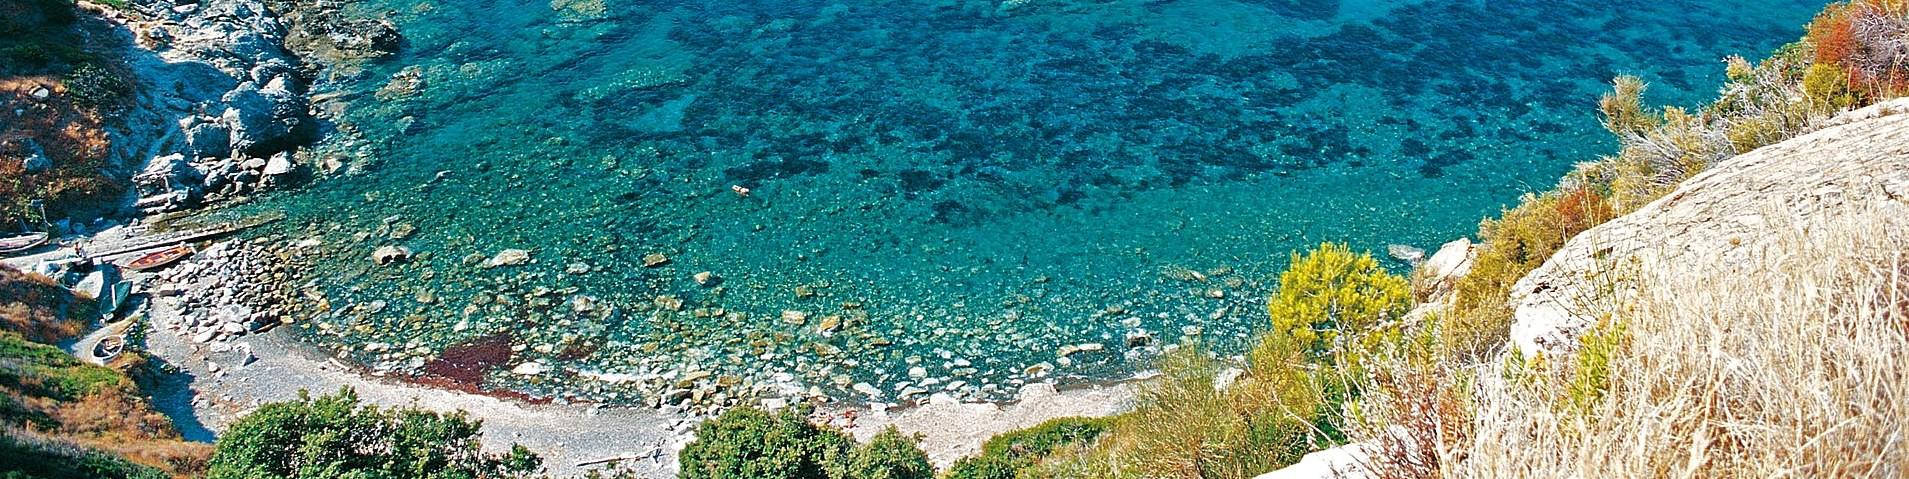 Marciana Marina, pláž Ogliera